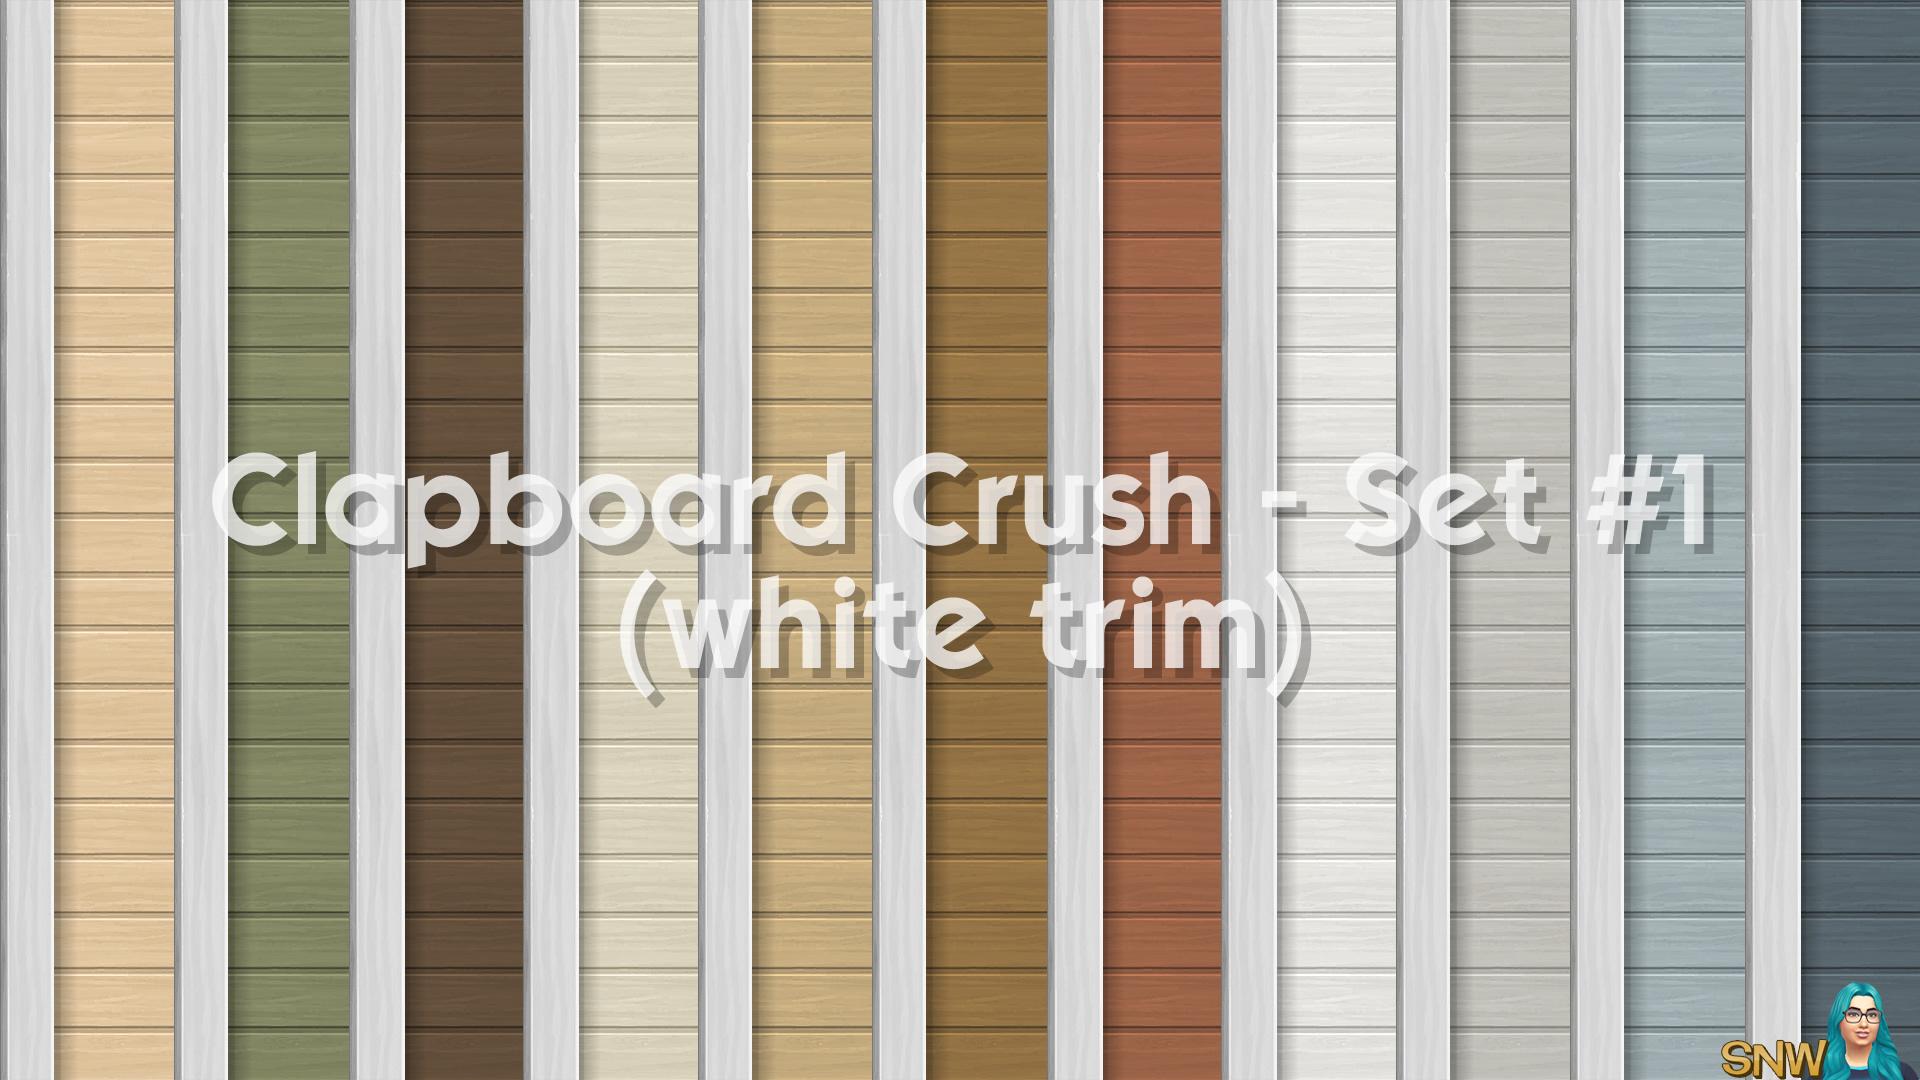 Clapboard Crush Siding Walls Set #1 (with White Corner Trim)